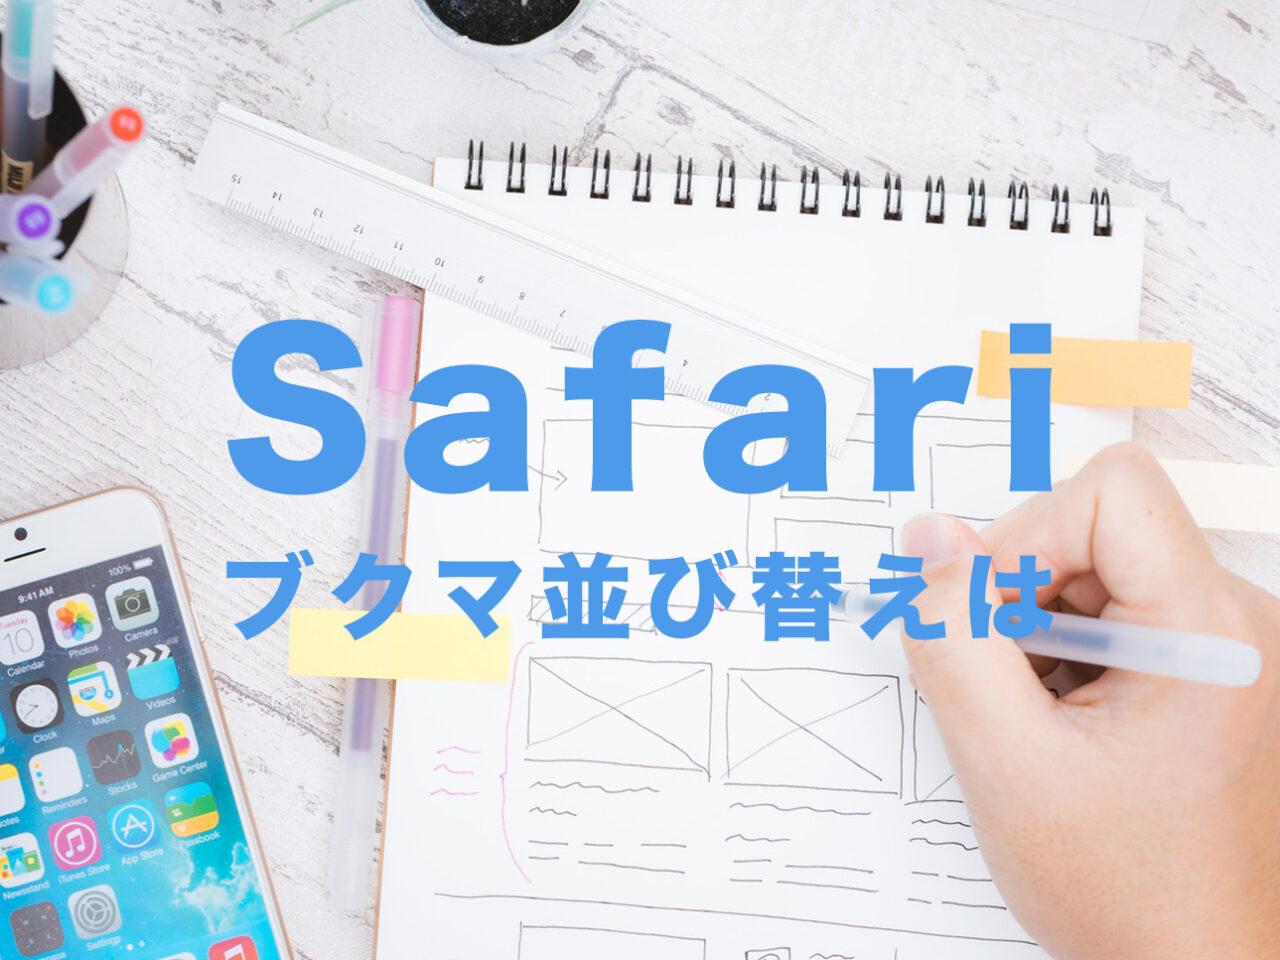 iPhoneのSafariでブックマークを並び替えるやり方&仕方を解説!のサムネイル画像